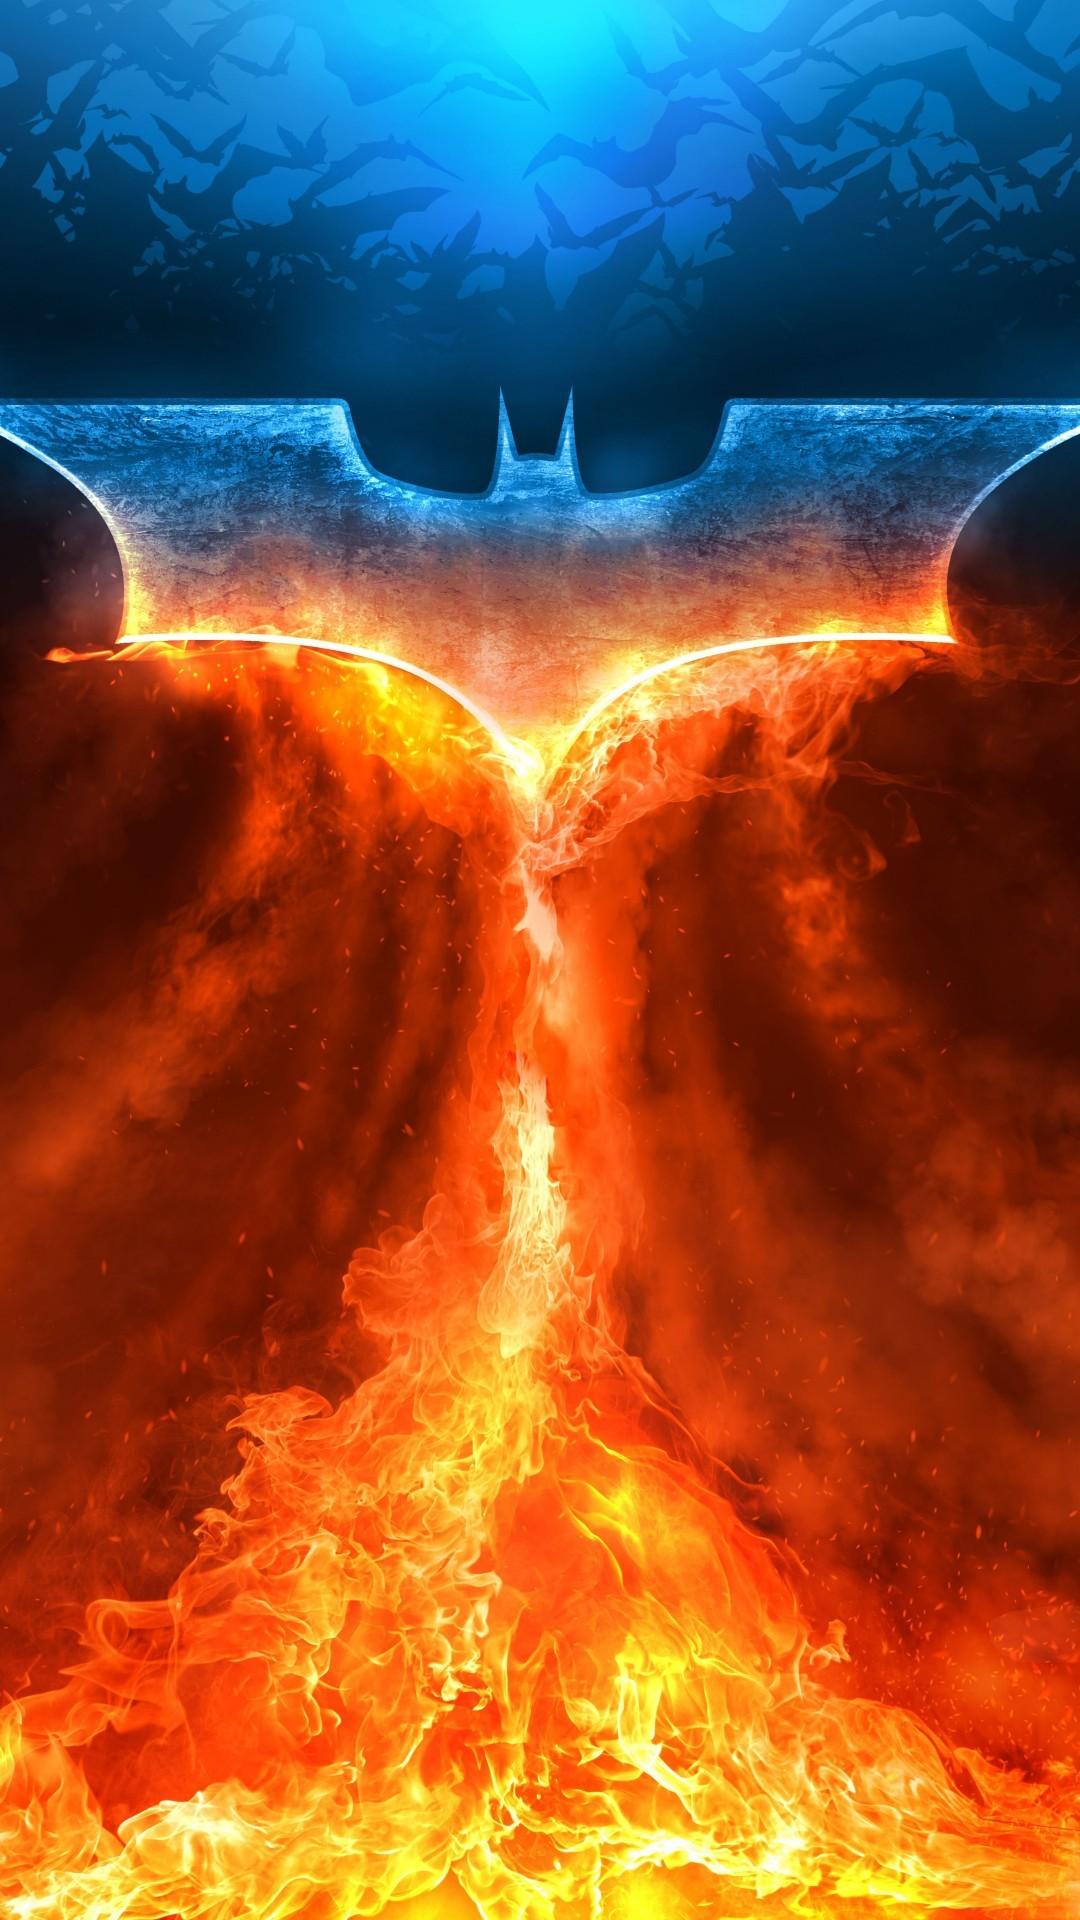 Free Batman Logo phone wallpaper by bethblaylock